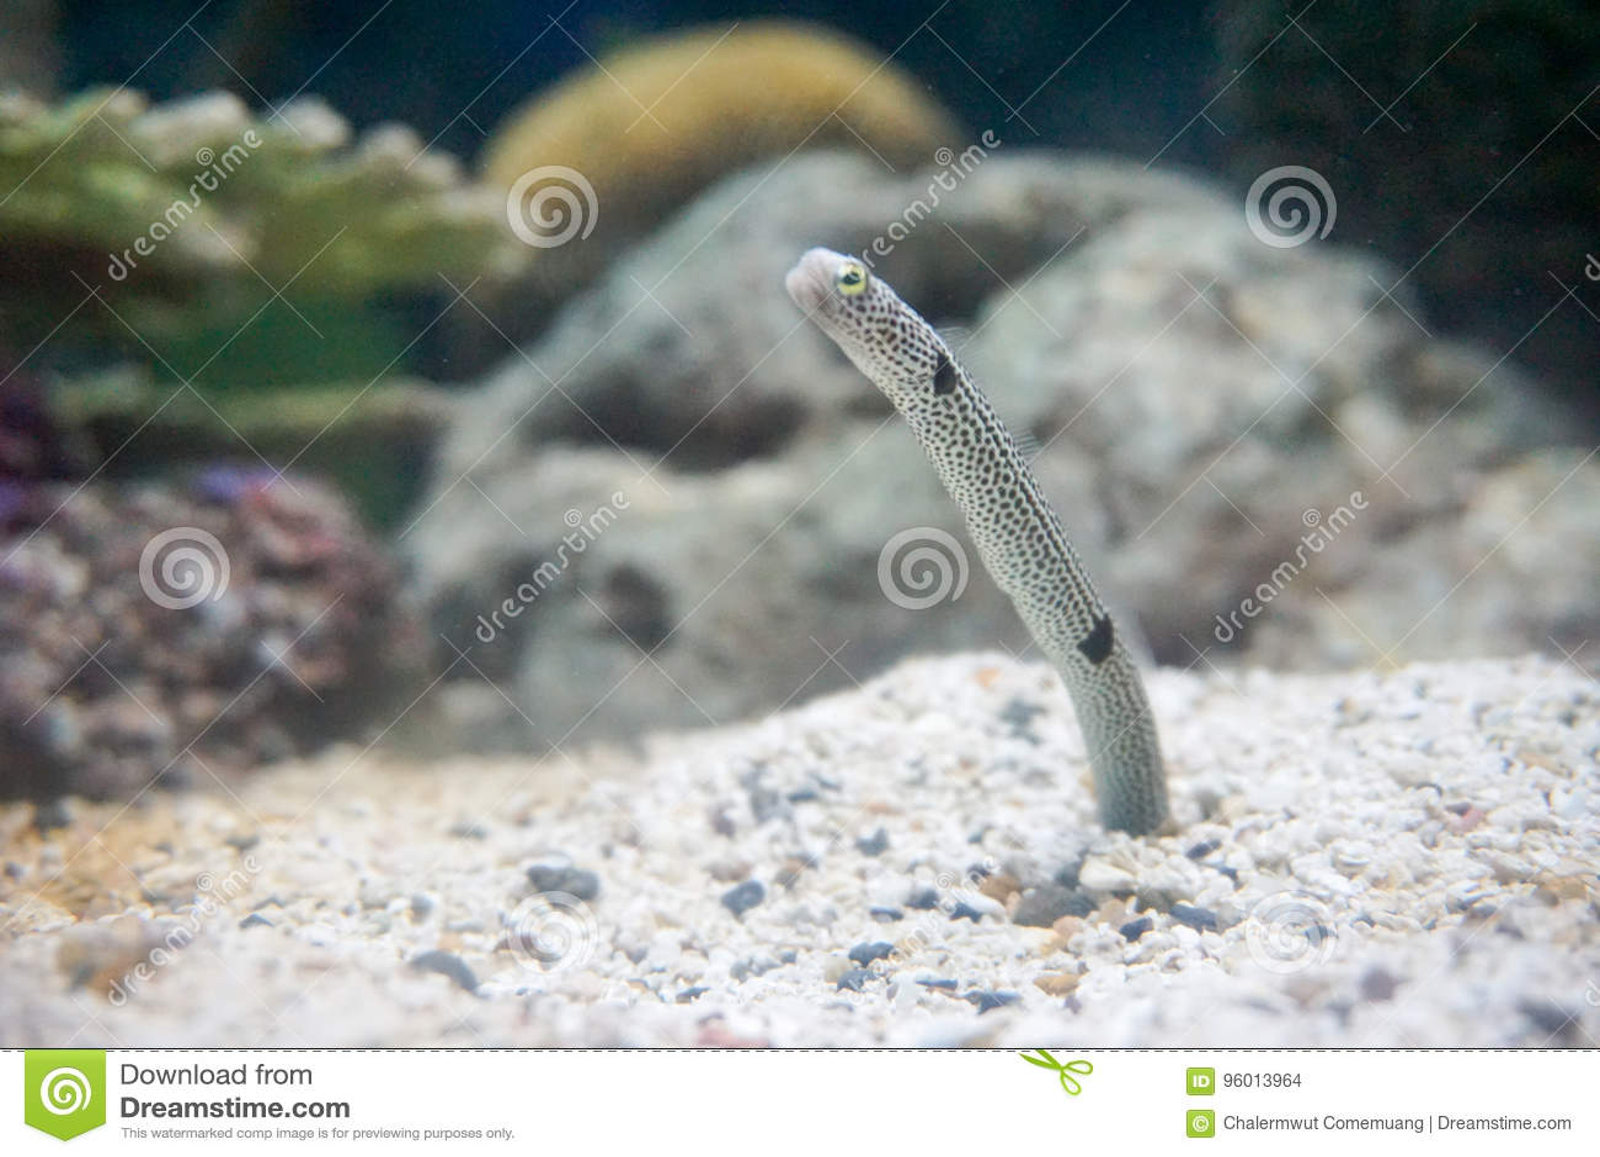 Spotted garden eel. stock photo. Image of aquarium, black